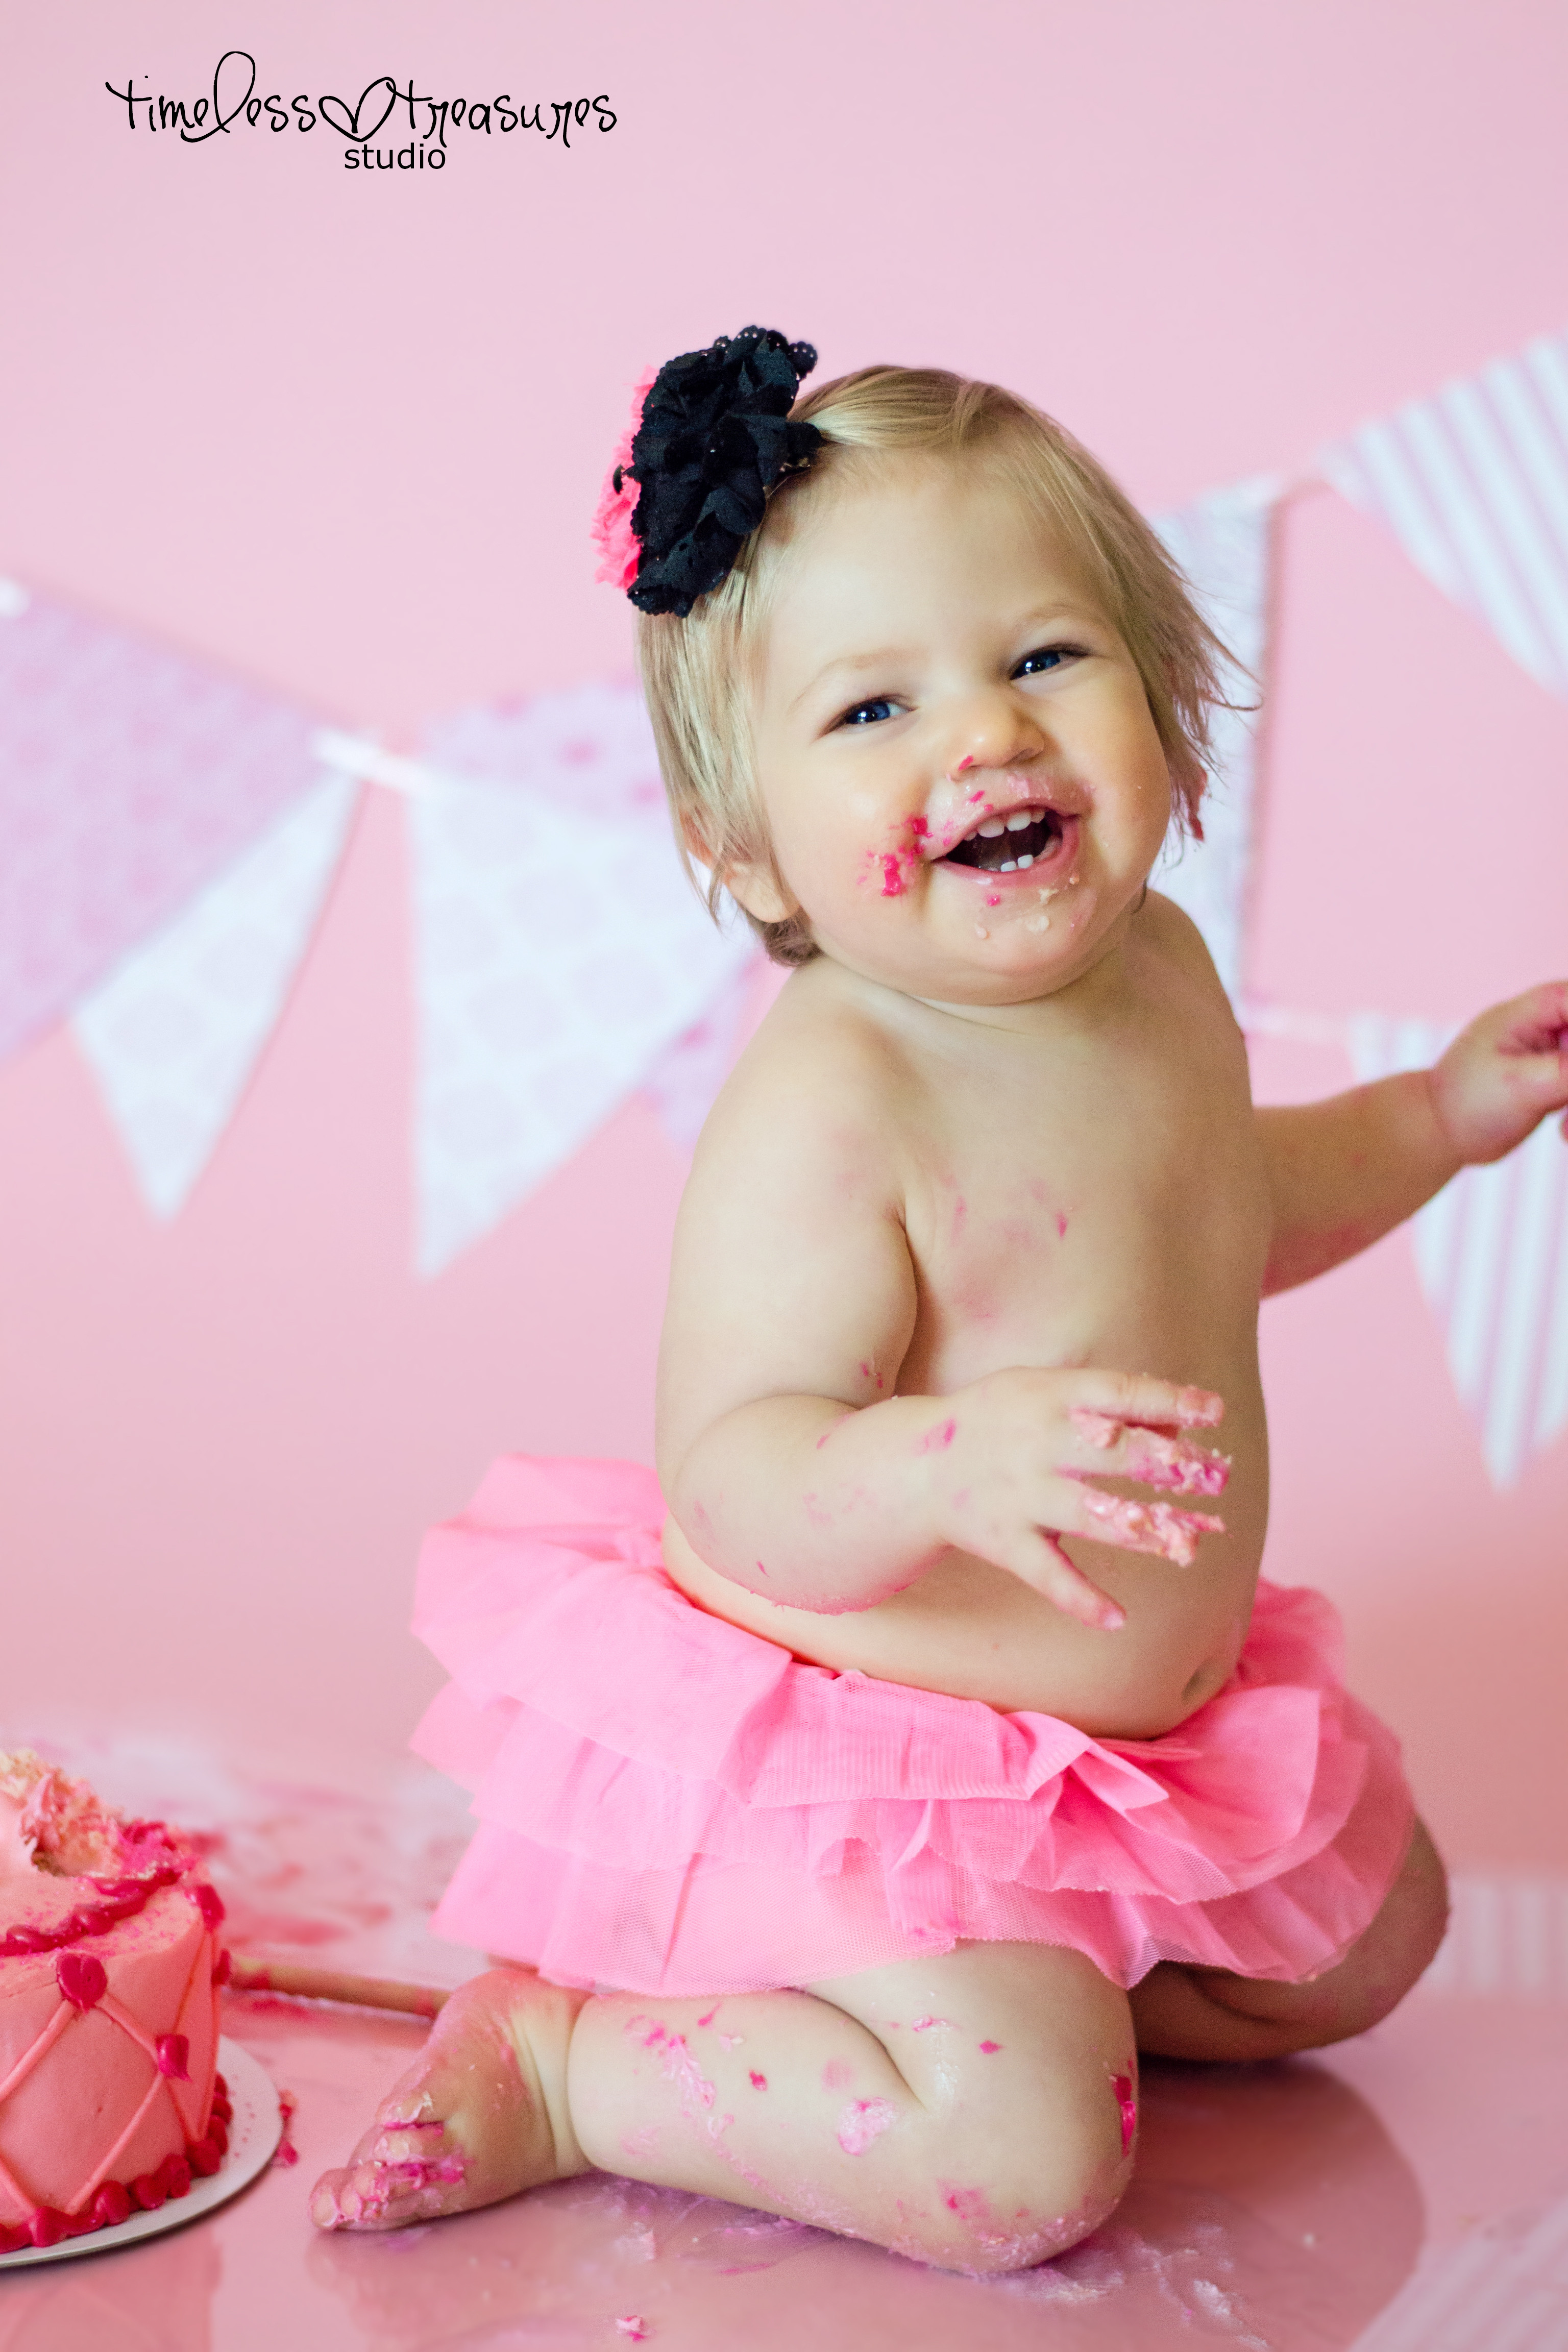 Best ideas about Birthday Cake Smash . Save or Pin DIY Cake Smash Now.